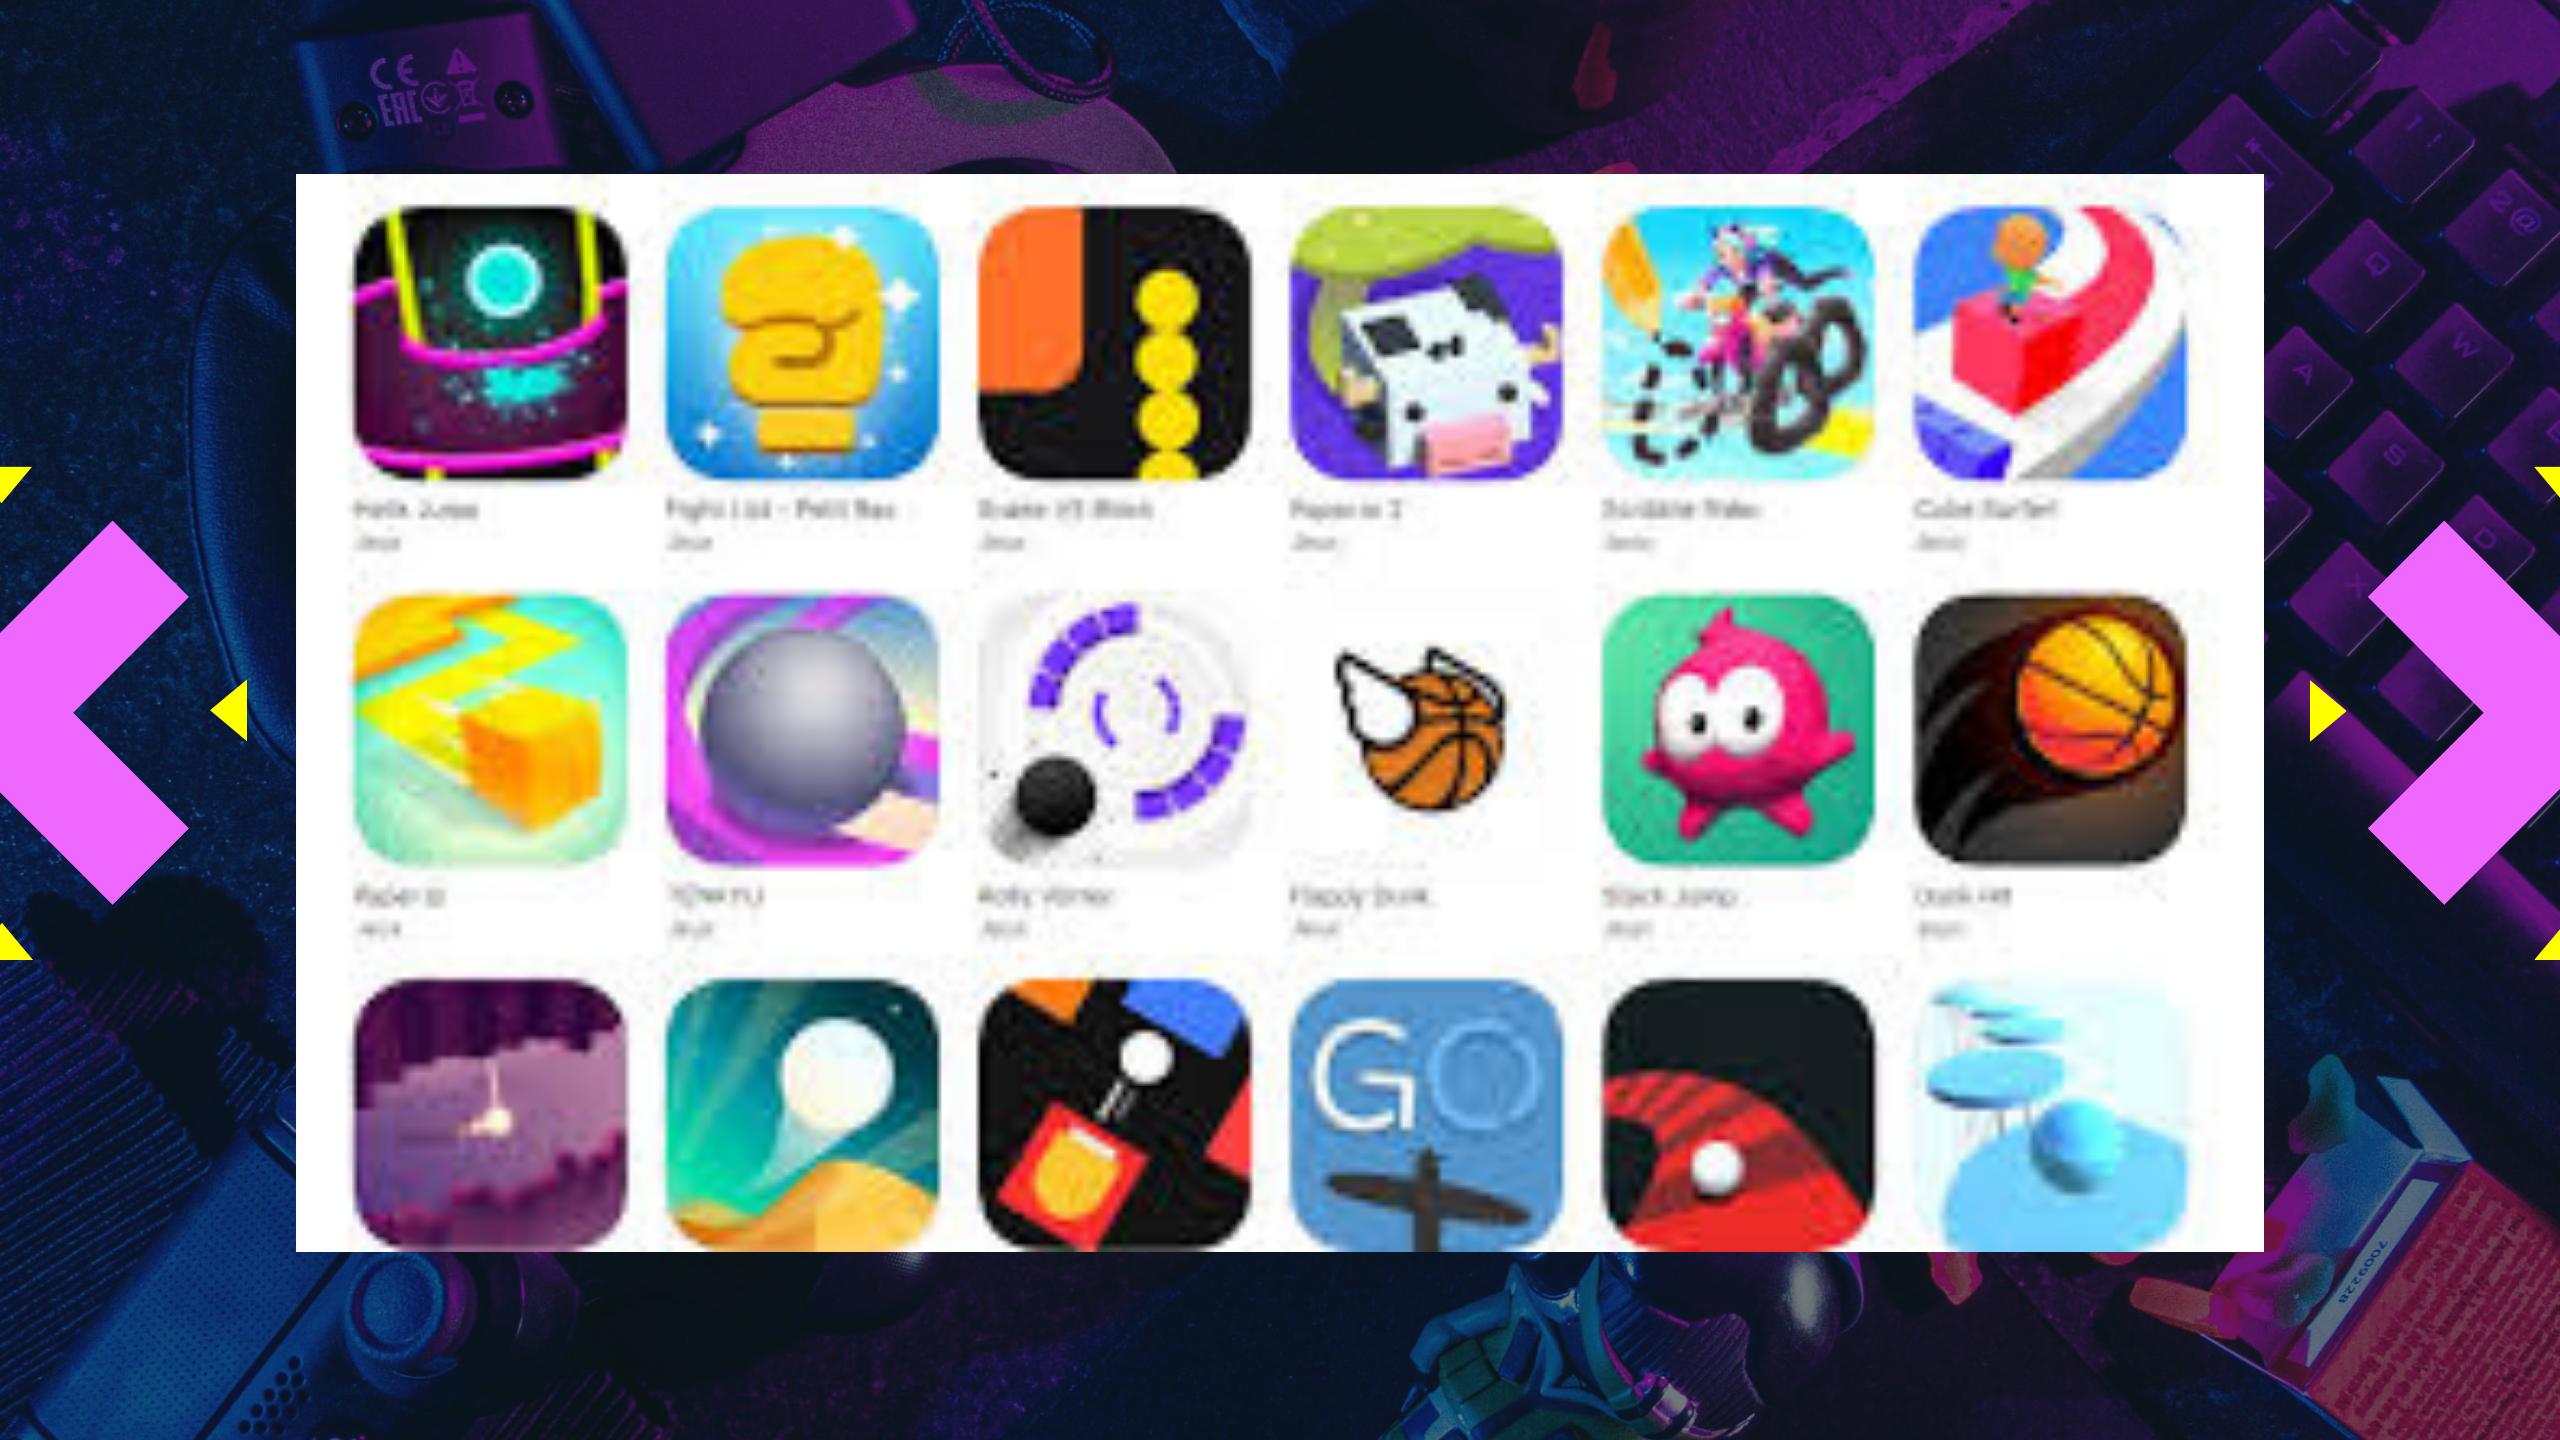 Voodoo la plateforme de jeu mobile